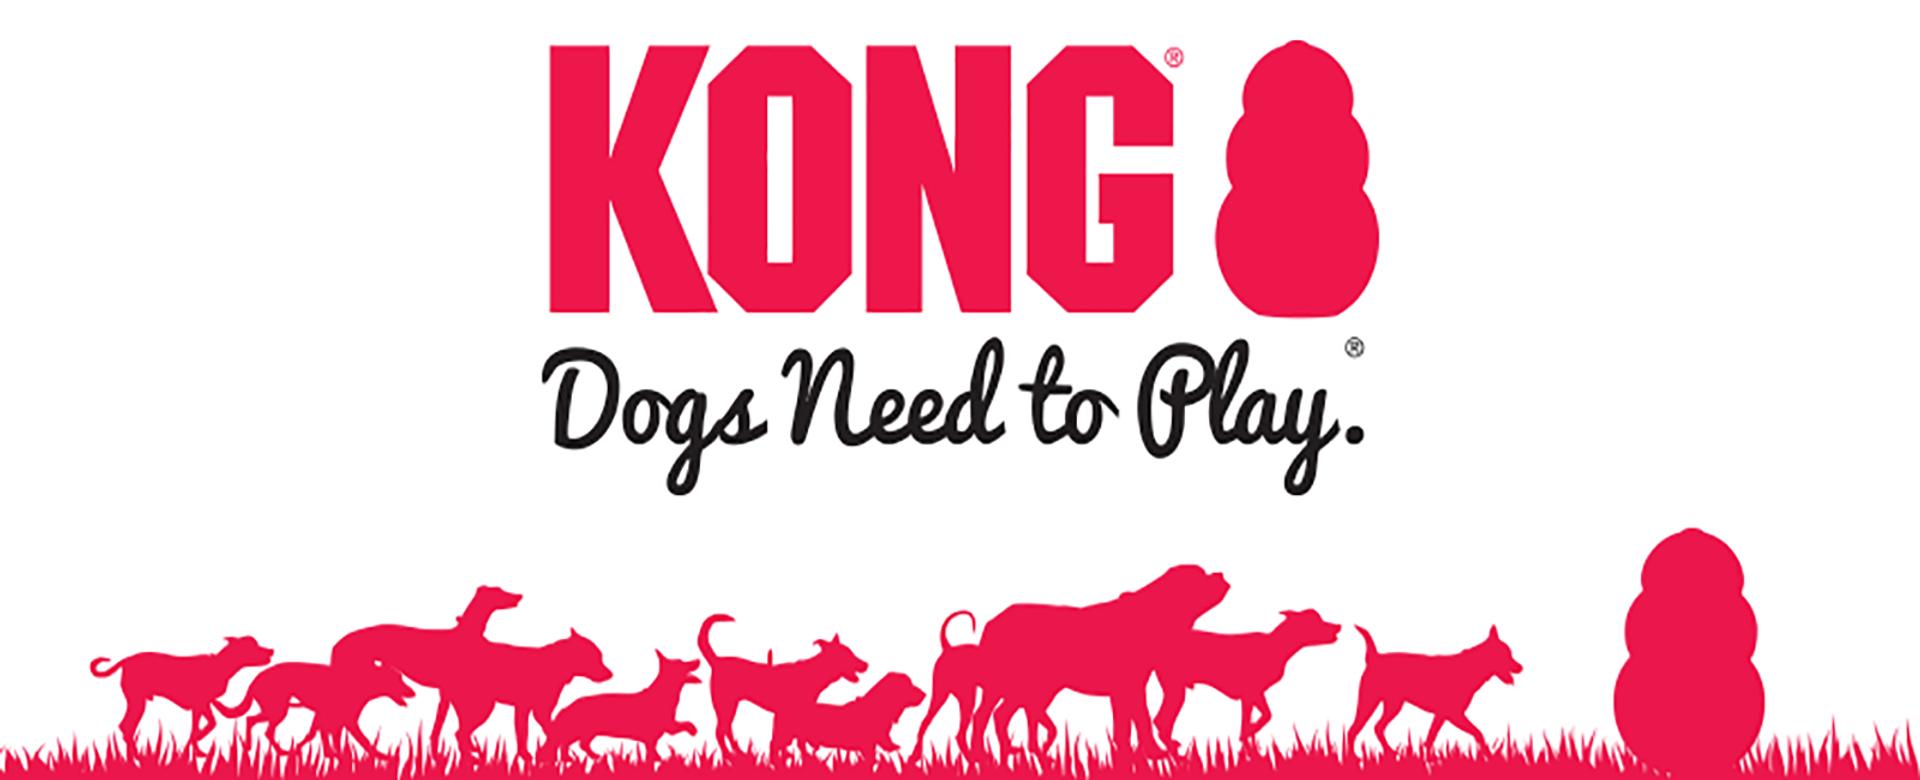 Kong hunde leker, kongcompany, holdbare hundeleker, trygge hundeleker, hundeleker til valper, hundeleker til voksne hunder, hundeleker til eldre hunder, dog toy, kong dog toys, iq leker hund, flytende hundeleker